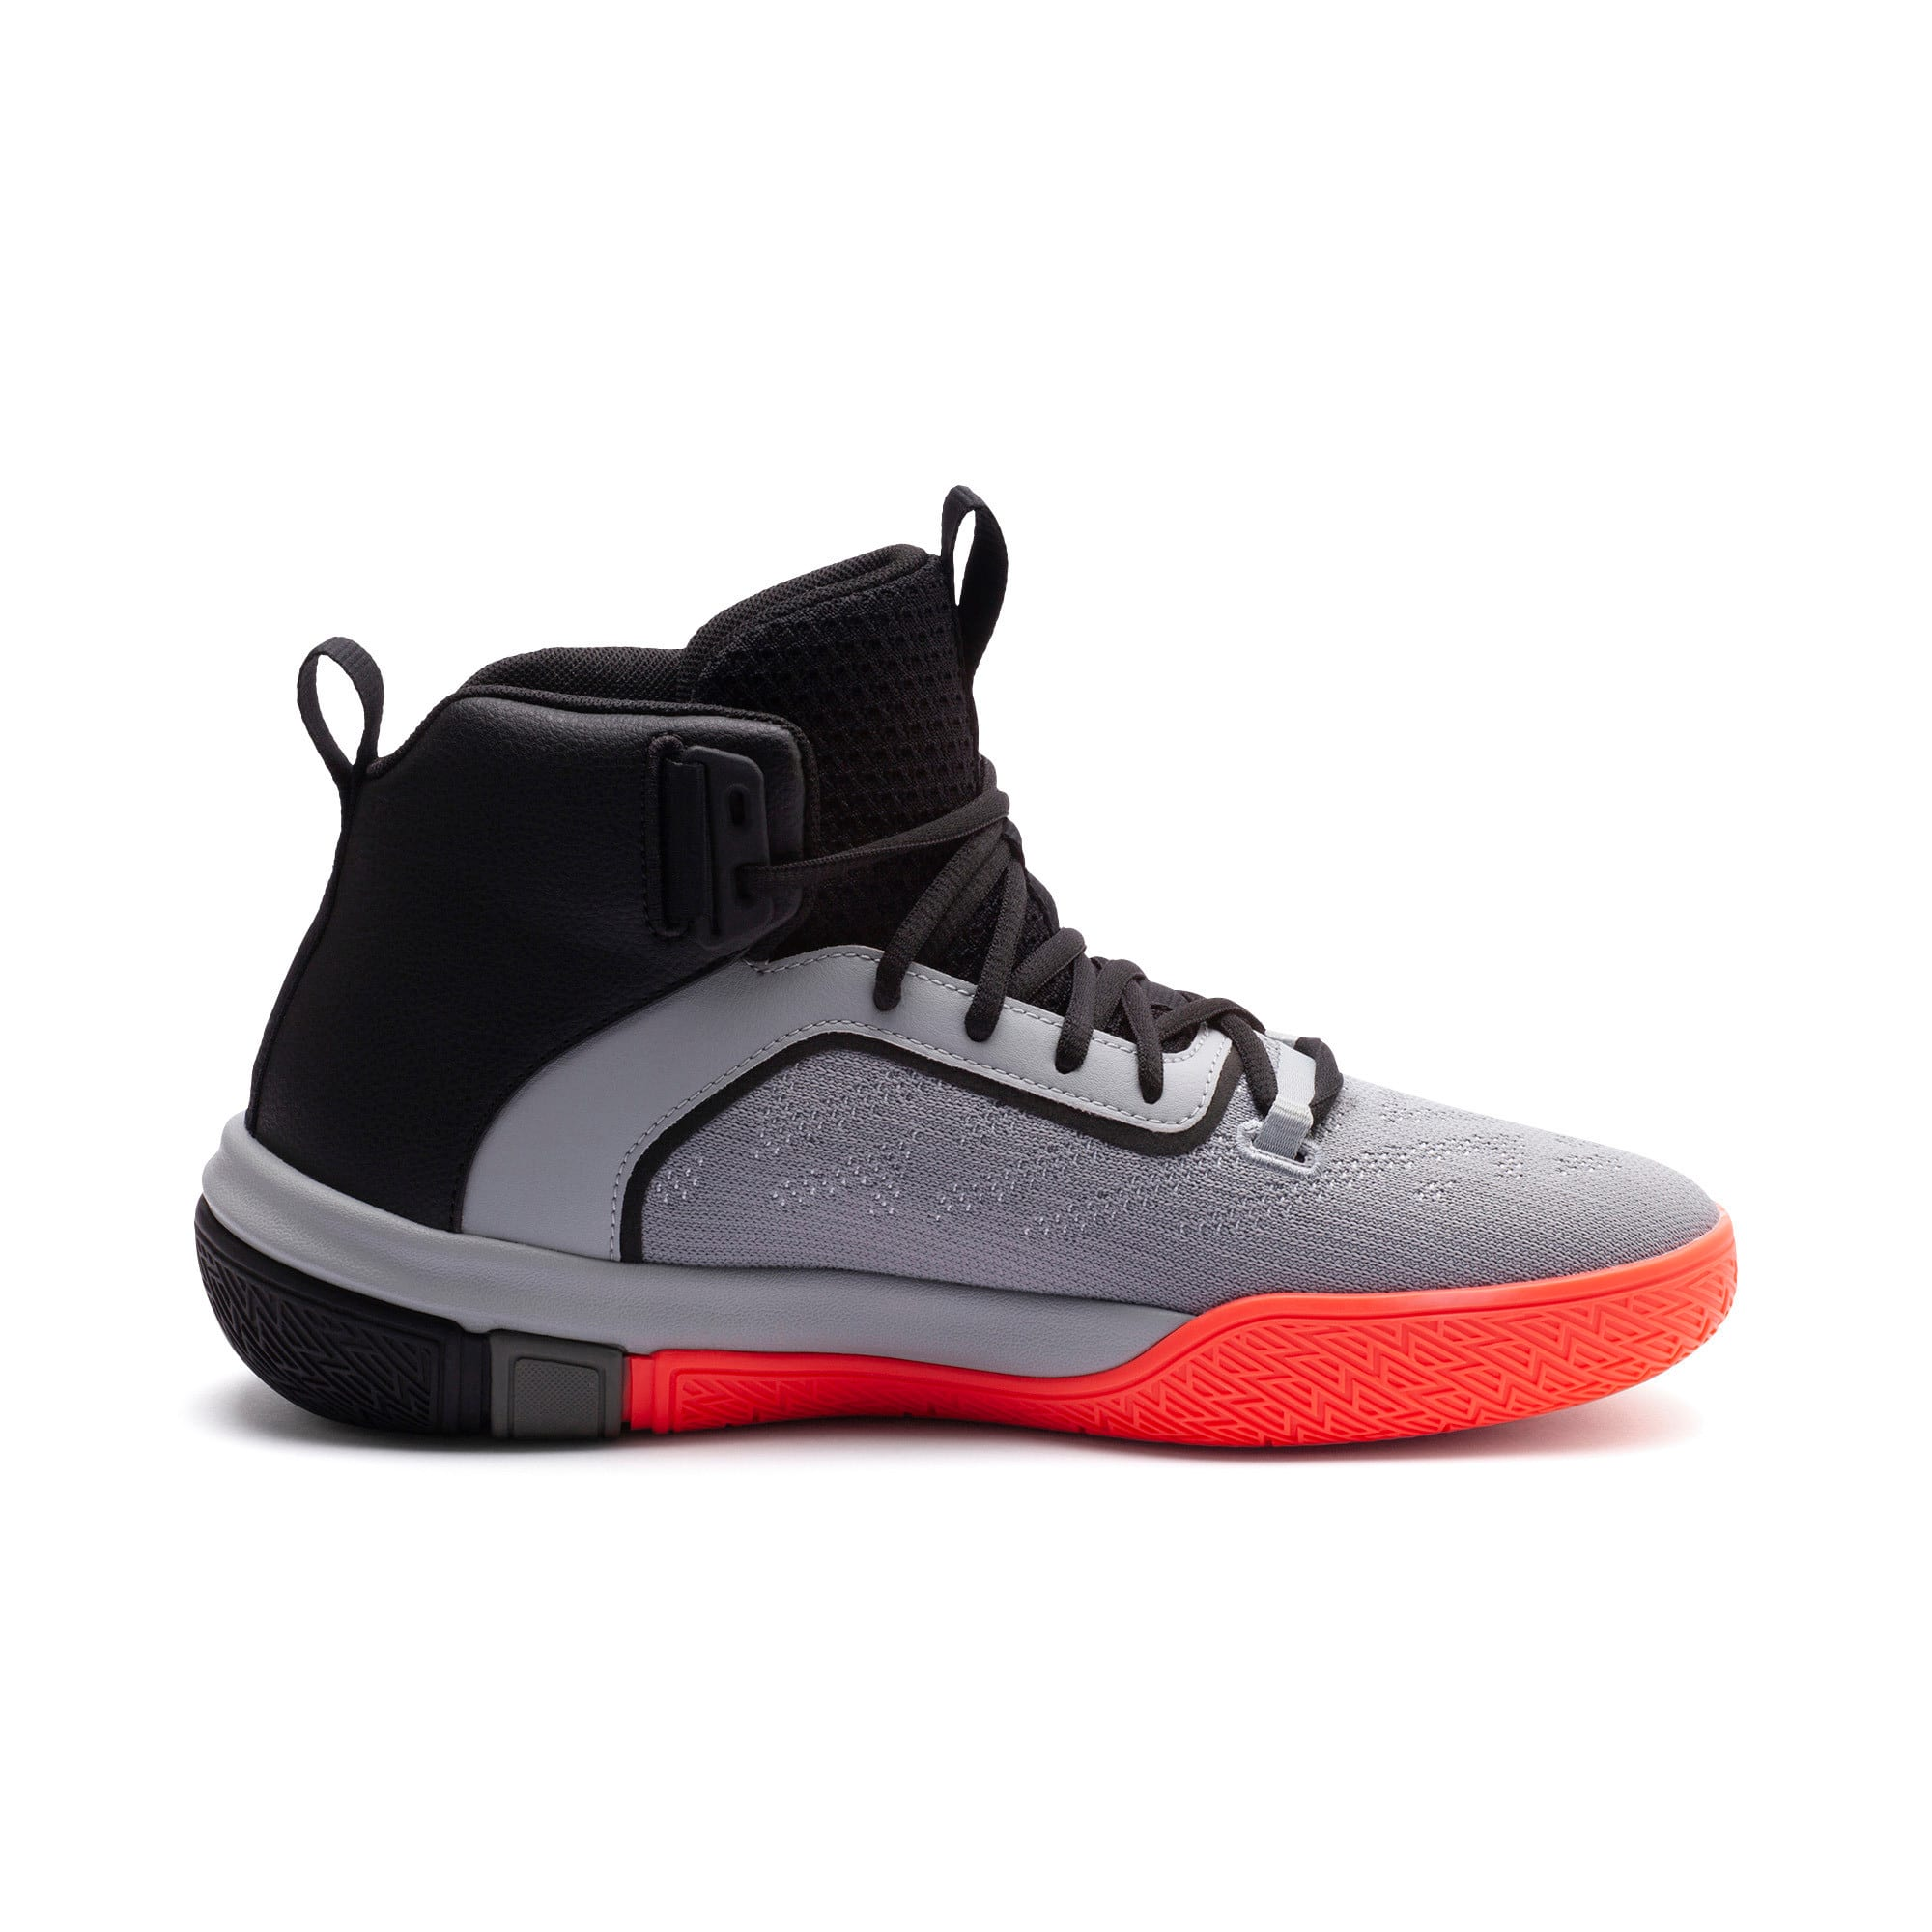 Thumbnail 5 of Legacy Disrupt Men's Basketball Shoes, Puma Black-Red Blast, medium